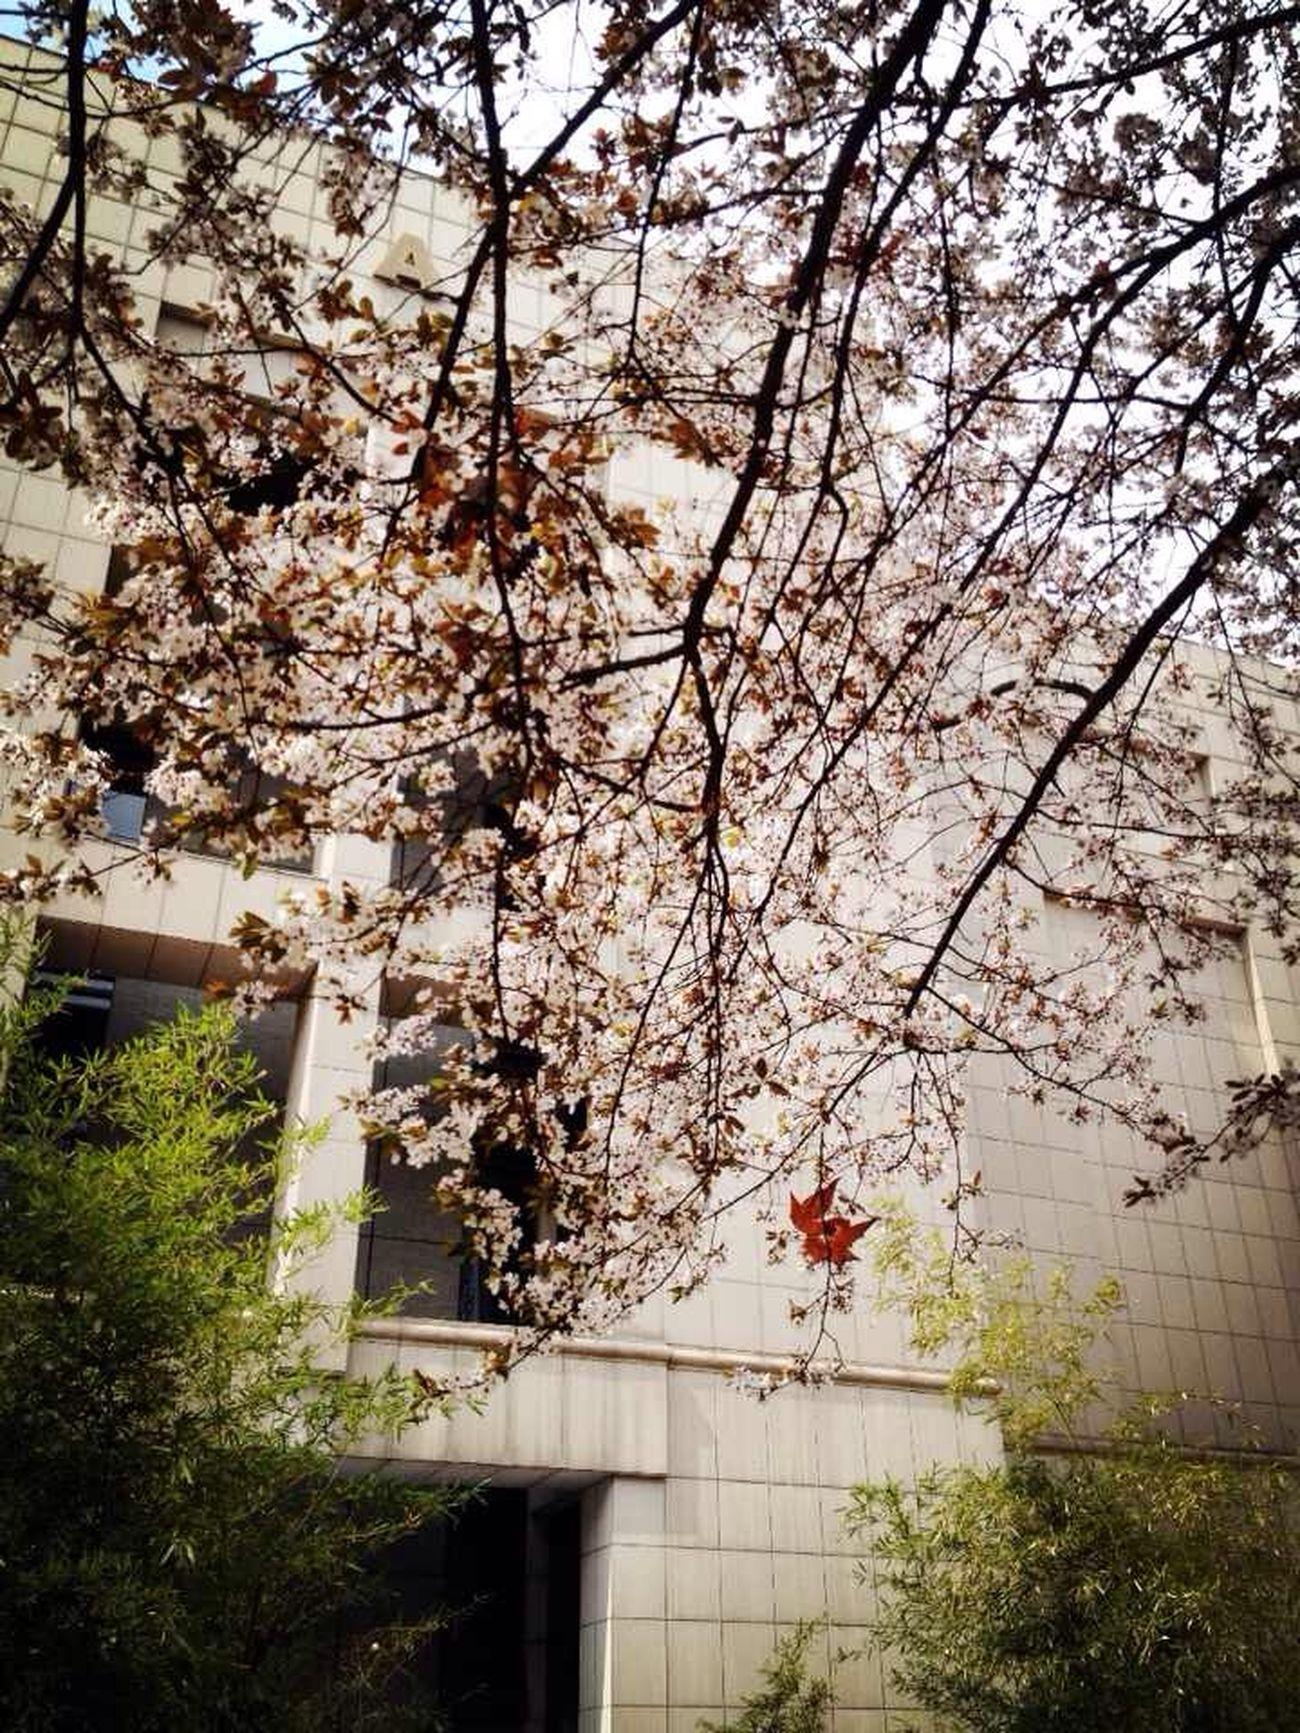 Spring (ॢ˘⌣˘ ॢ⑅)